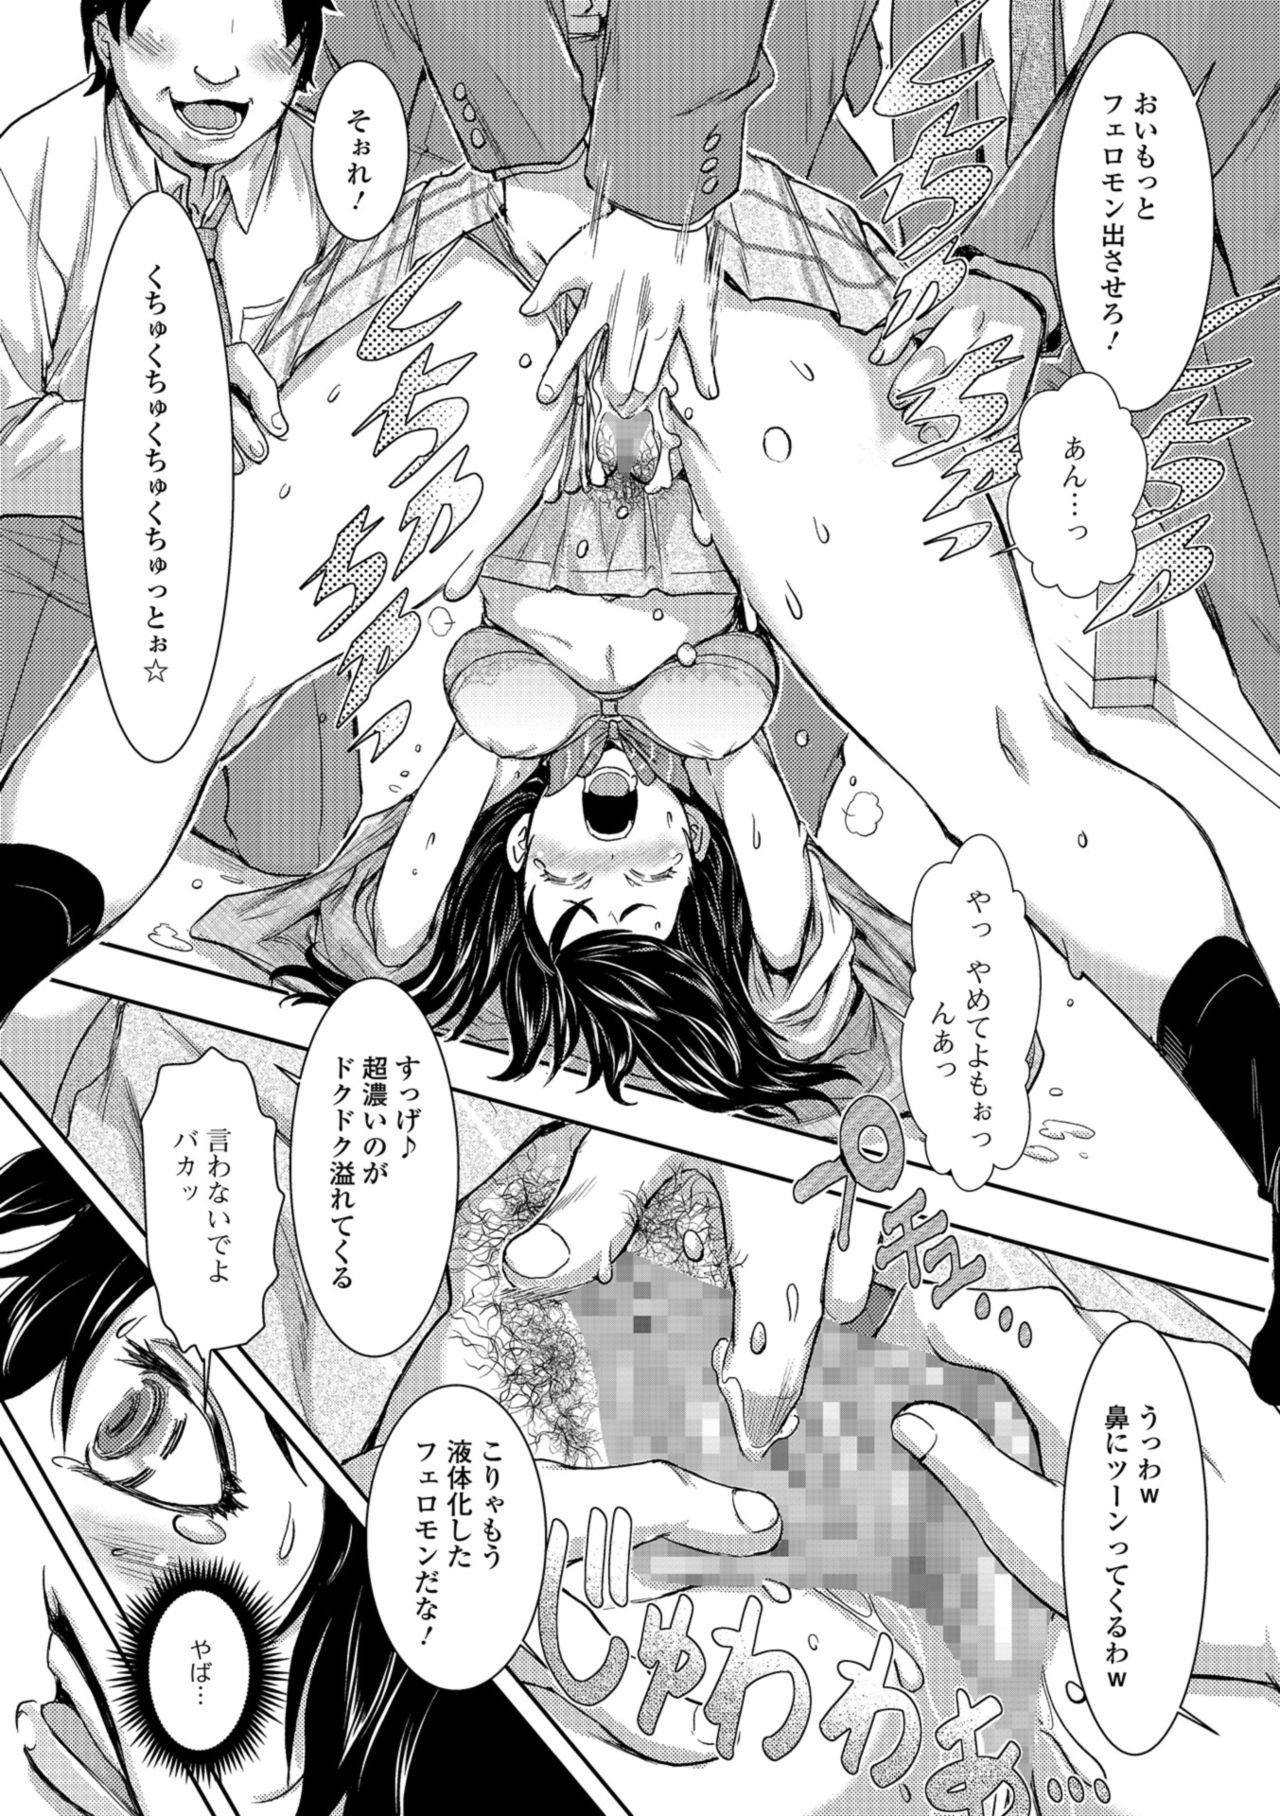 COMIC Shigekiteki SQUIRT!! Vol. 09 13